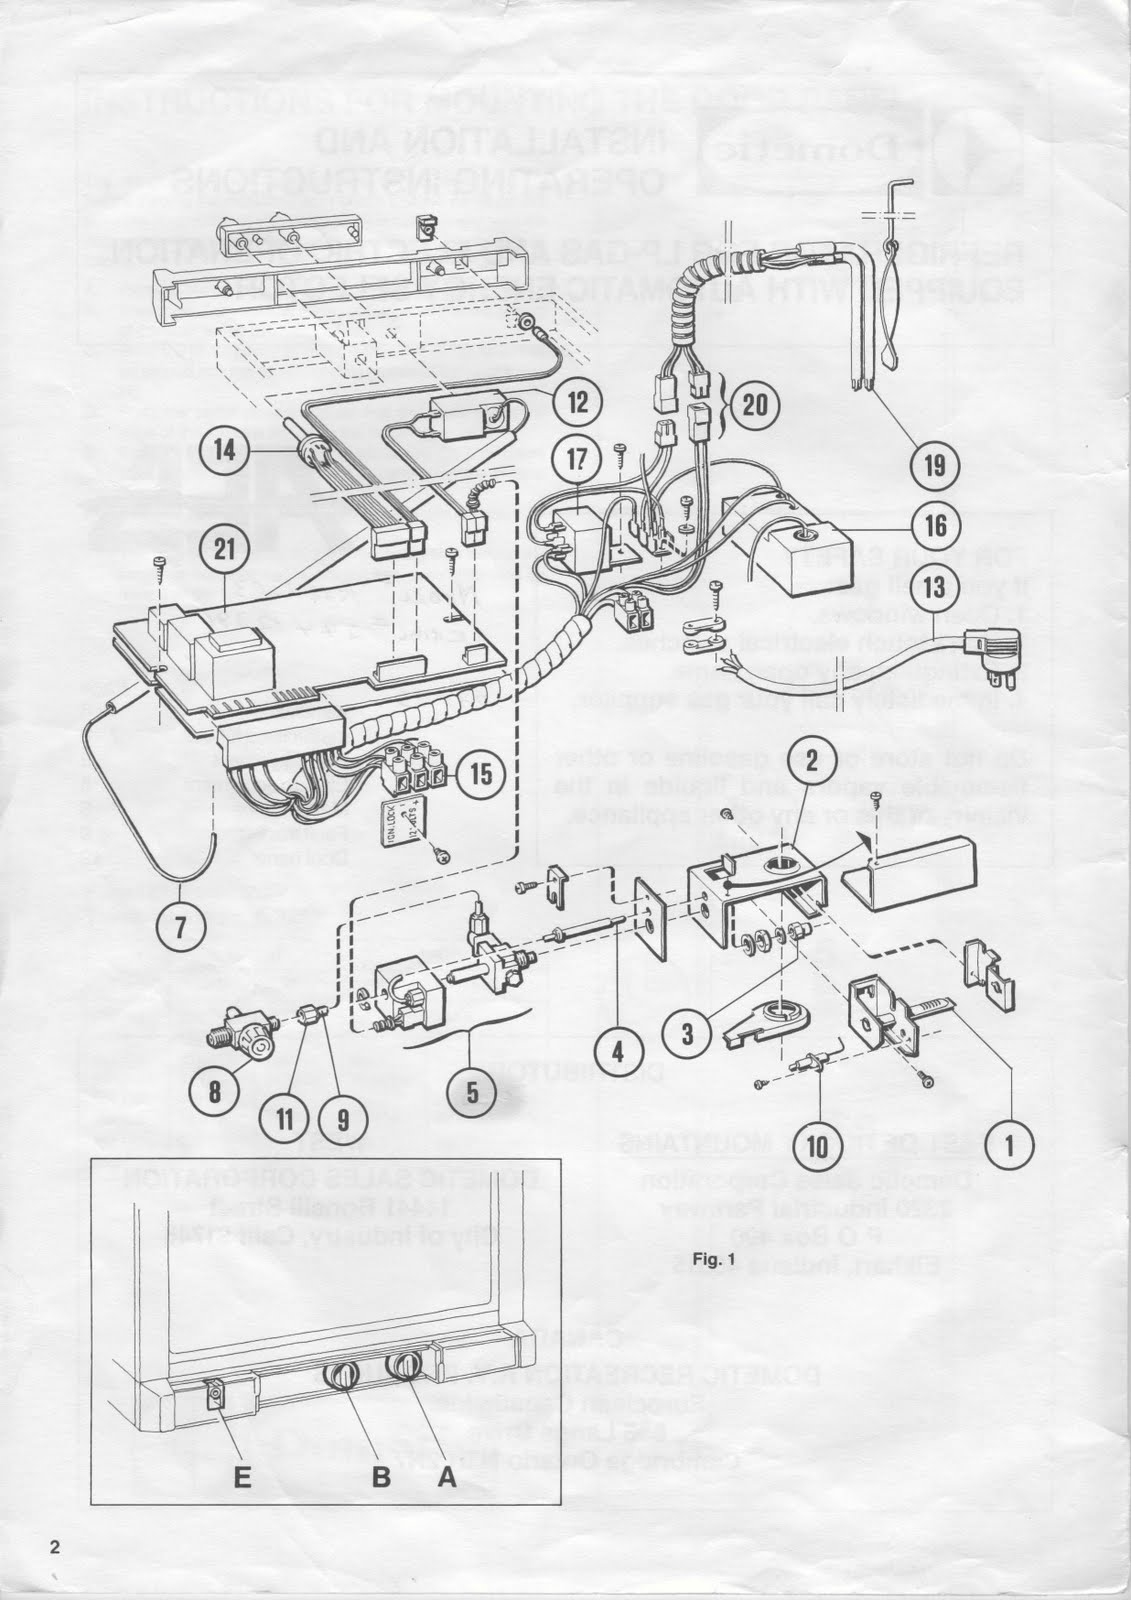 1983 Fleetwood Pace Arrow Owners Manuals: Dometic Refridgerator RM1303 operation manual